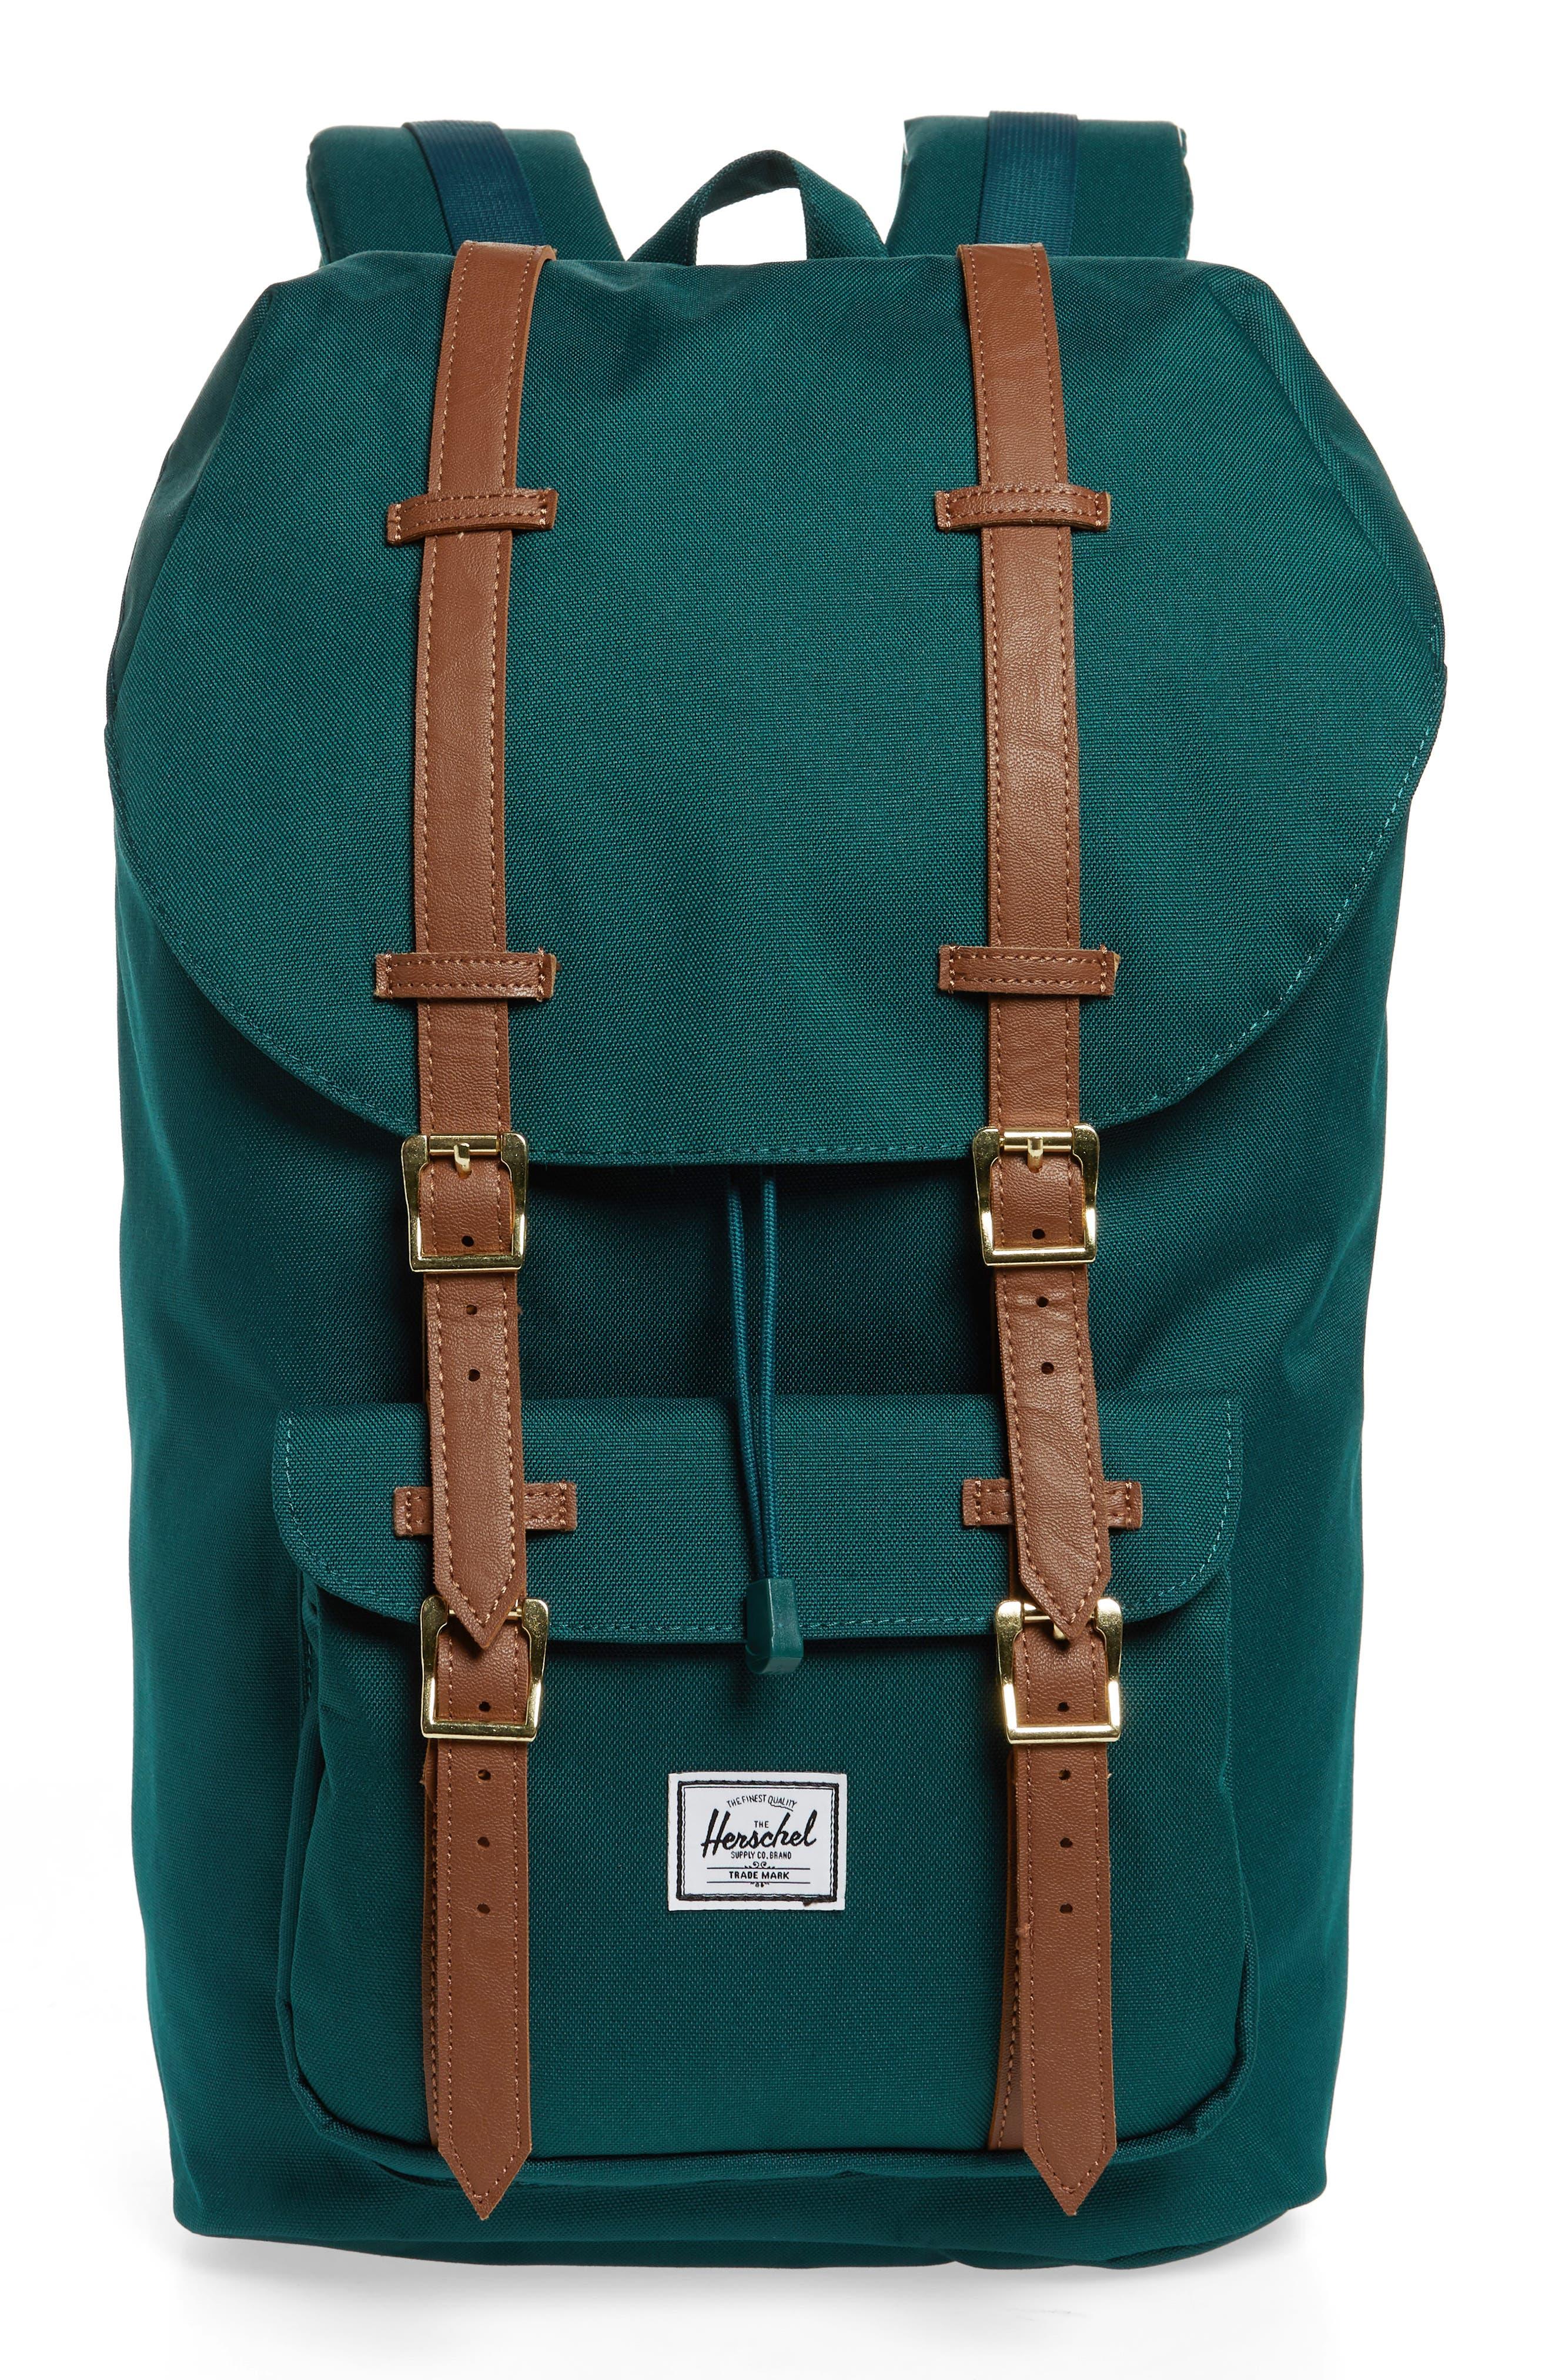 Little America Backpack,                         Main,                         color, DEEP TEAL/ TAN